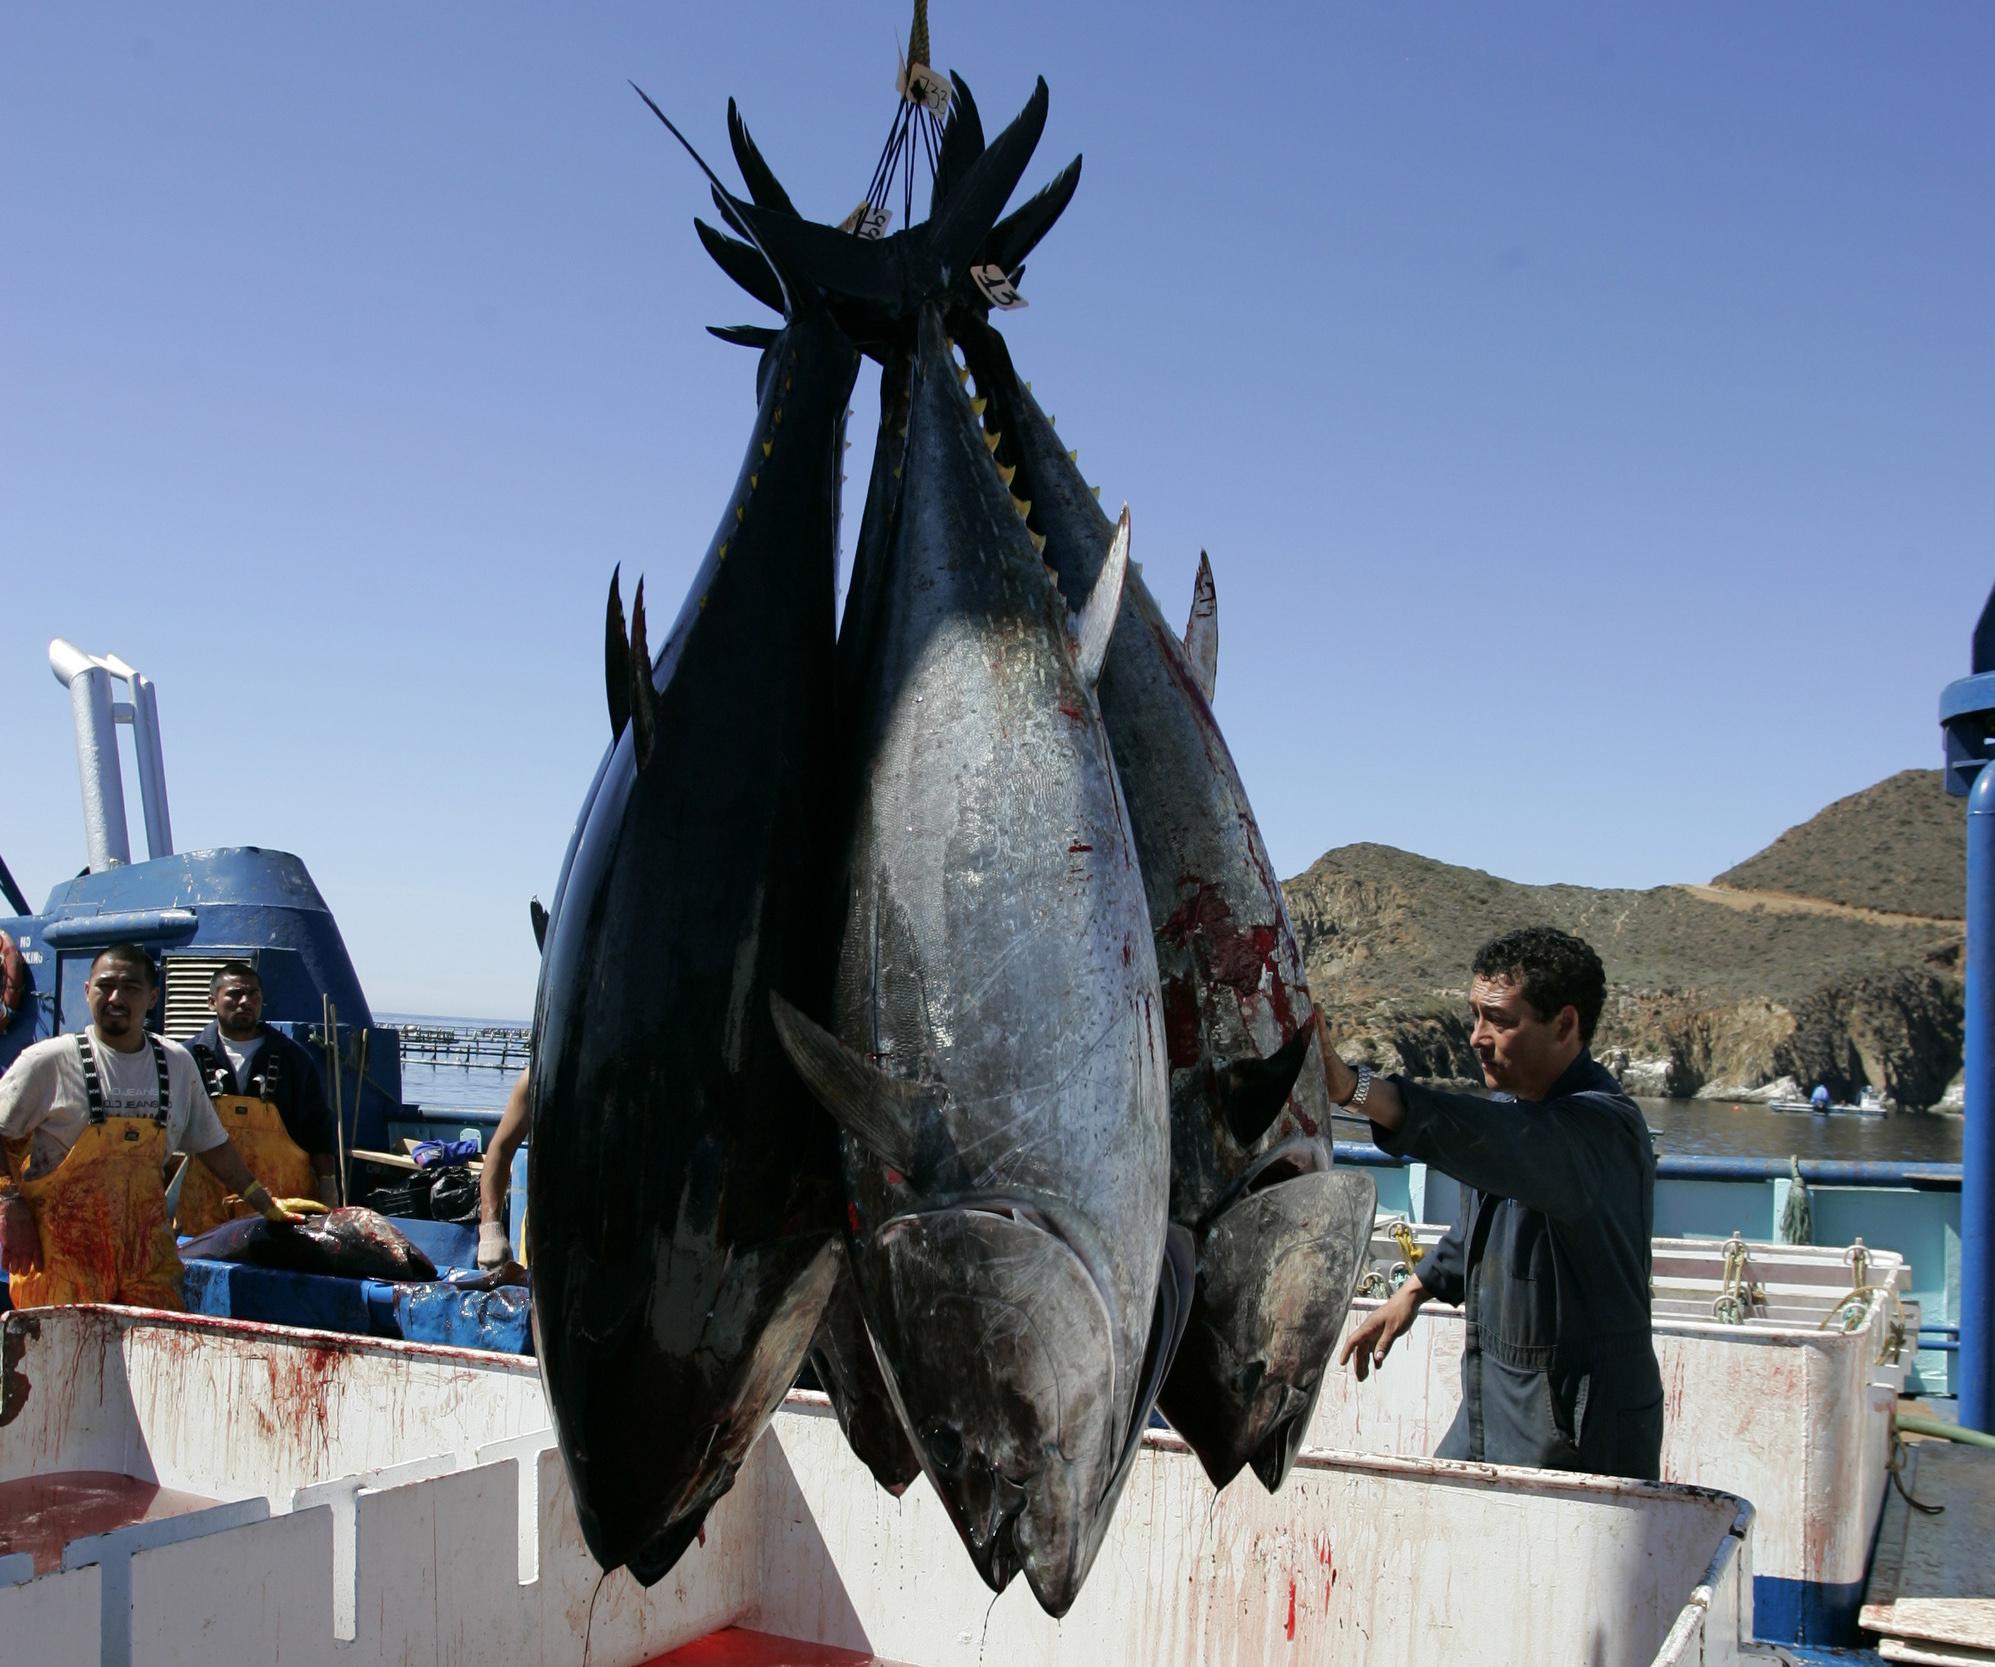 Giant radioactive fish cross the pacific ocean the for Pacific ocean radiation fish